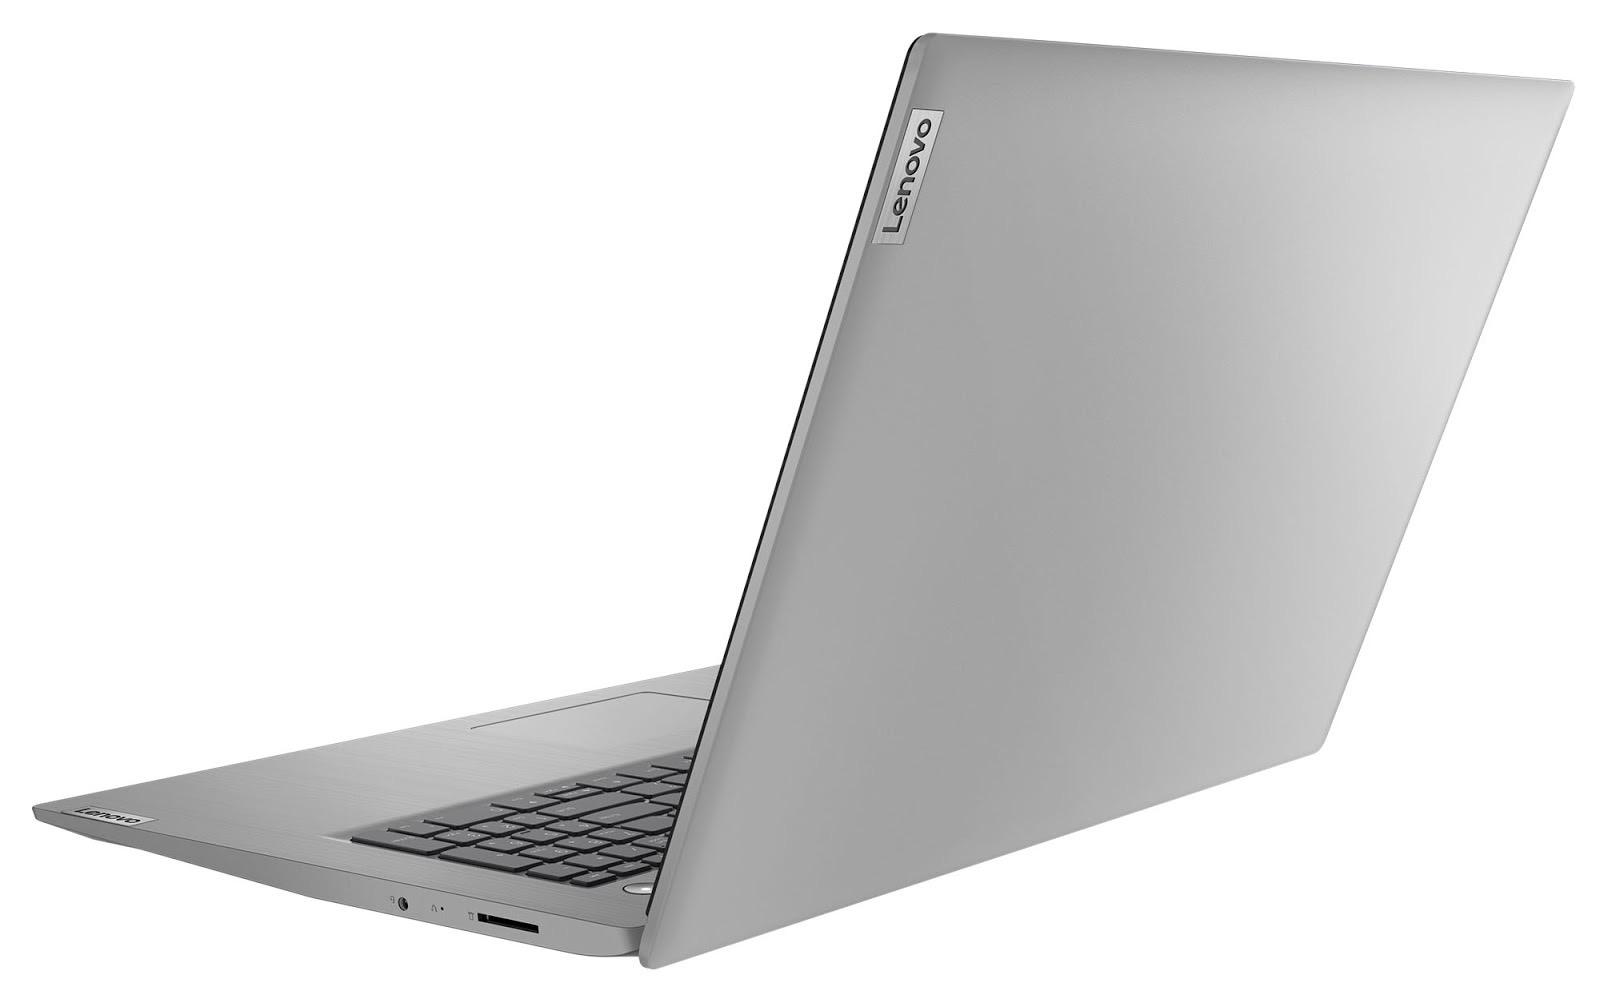 Фото 1. Ноутбук Lenovo ideapad 3 17ADA05 Platinum Grey (81W20044RE)